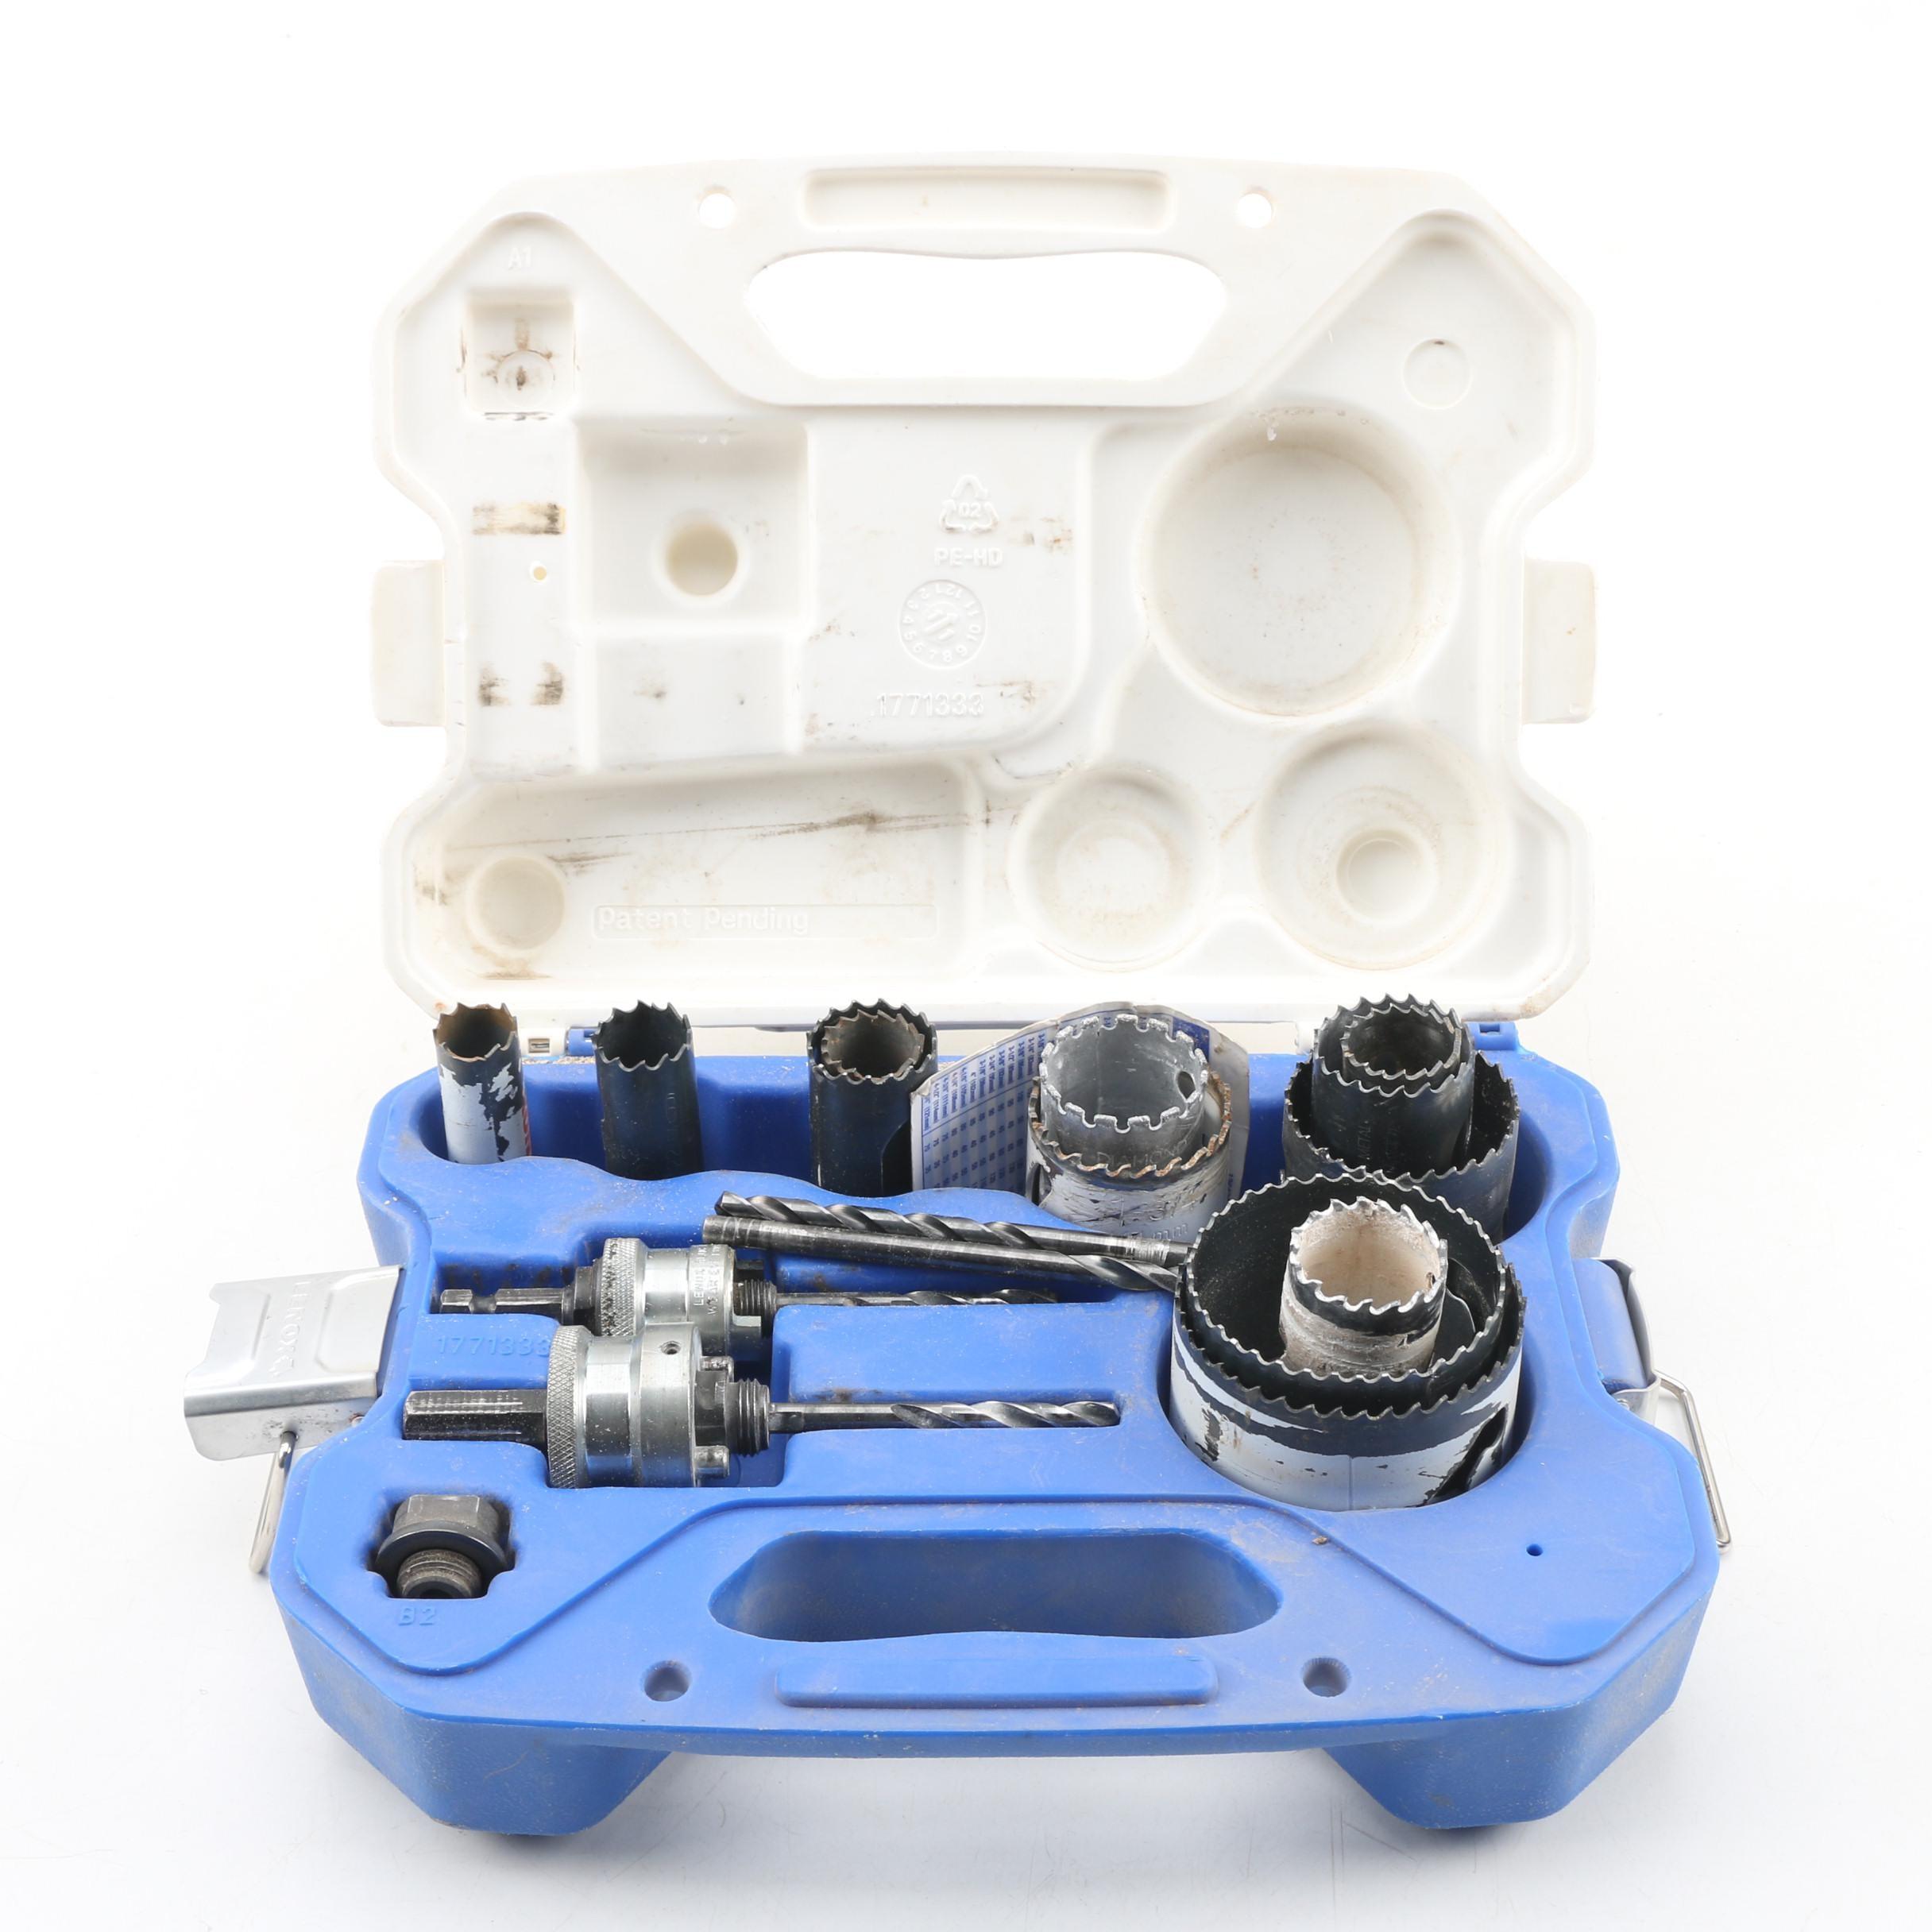 Lenox Nine-Piece Plumber's Hole Saw Kit